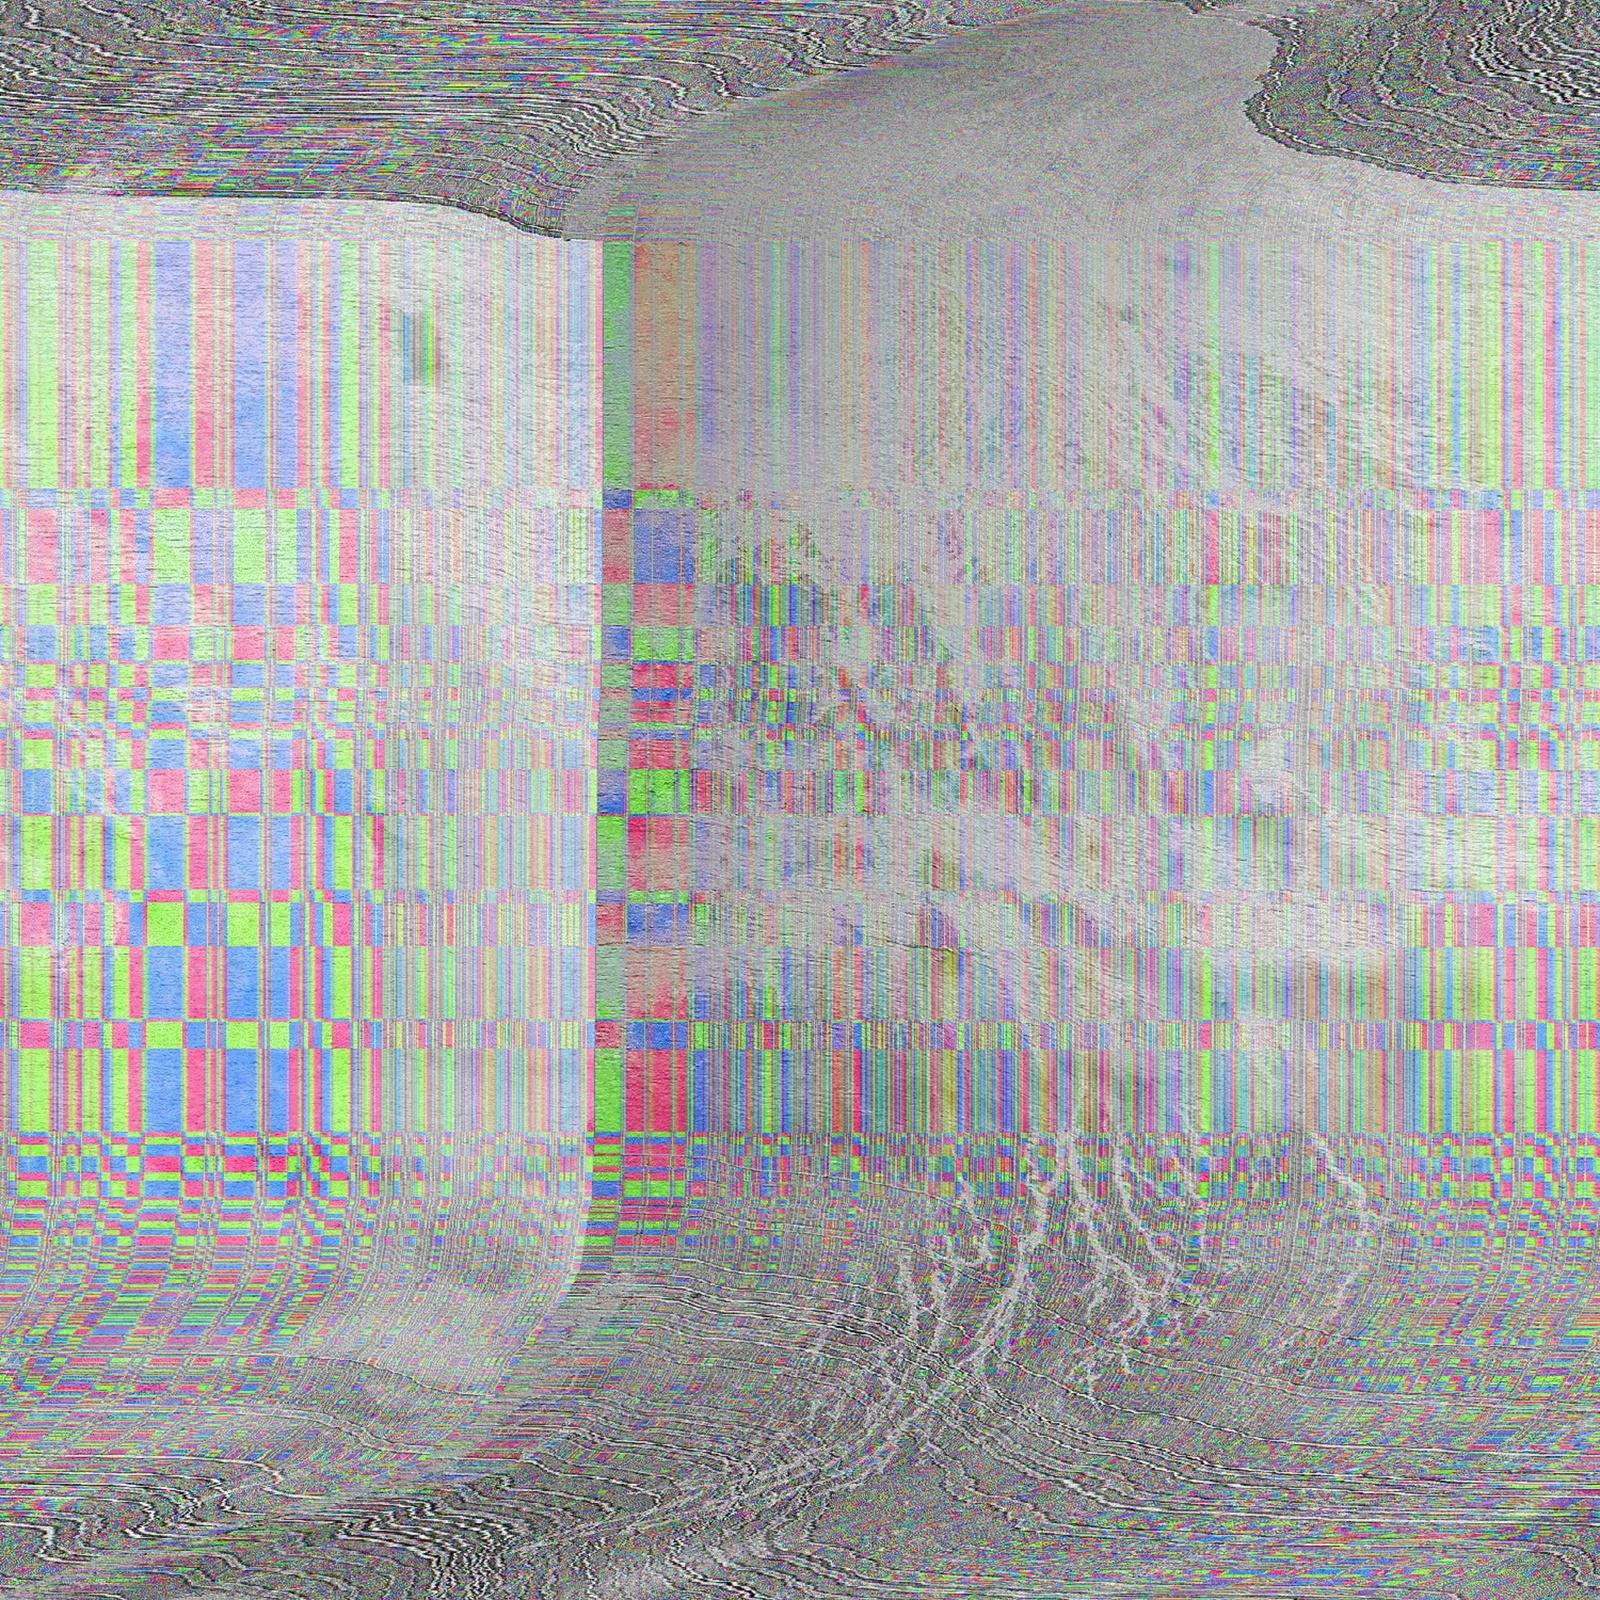 162653-11831054-photo_3_new_revised_jpg.jpg